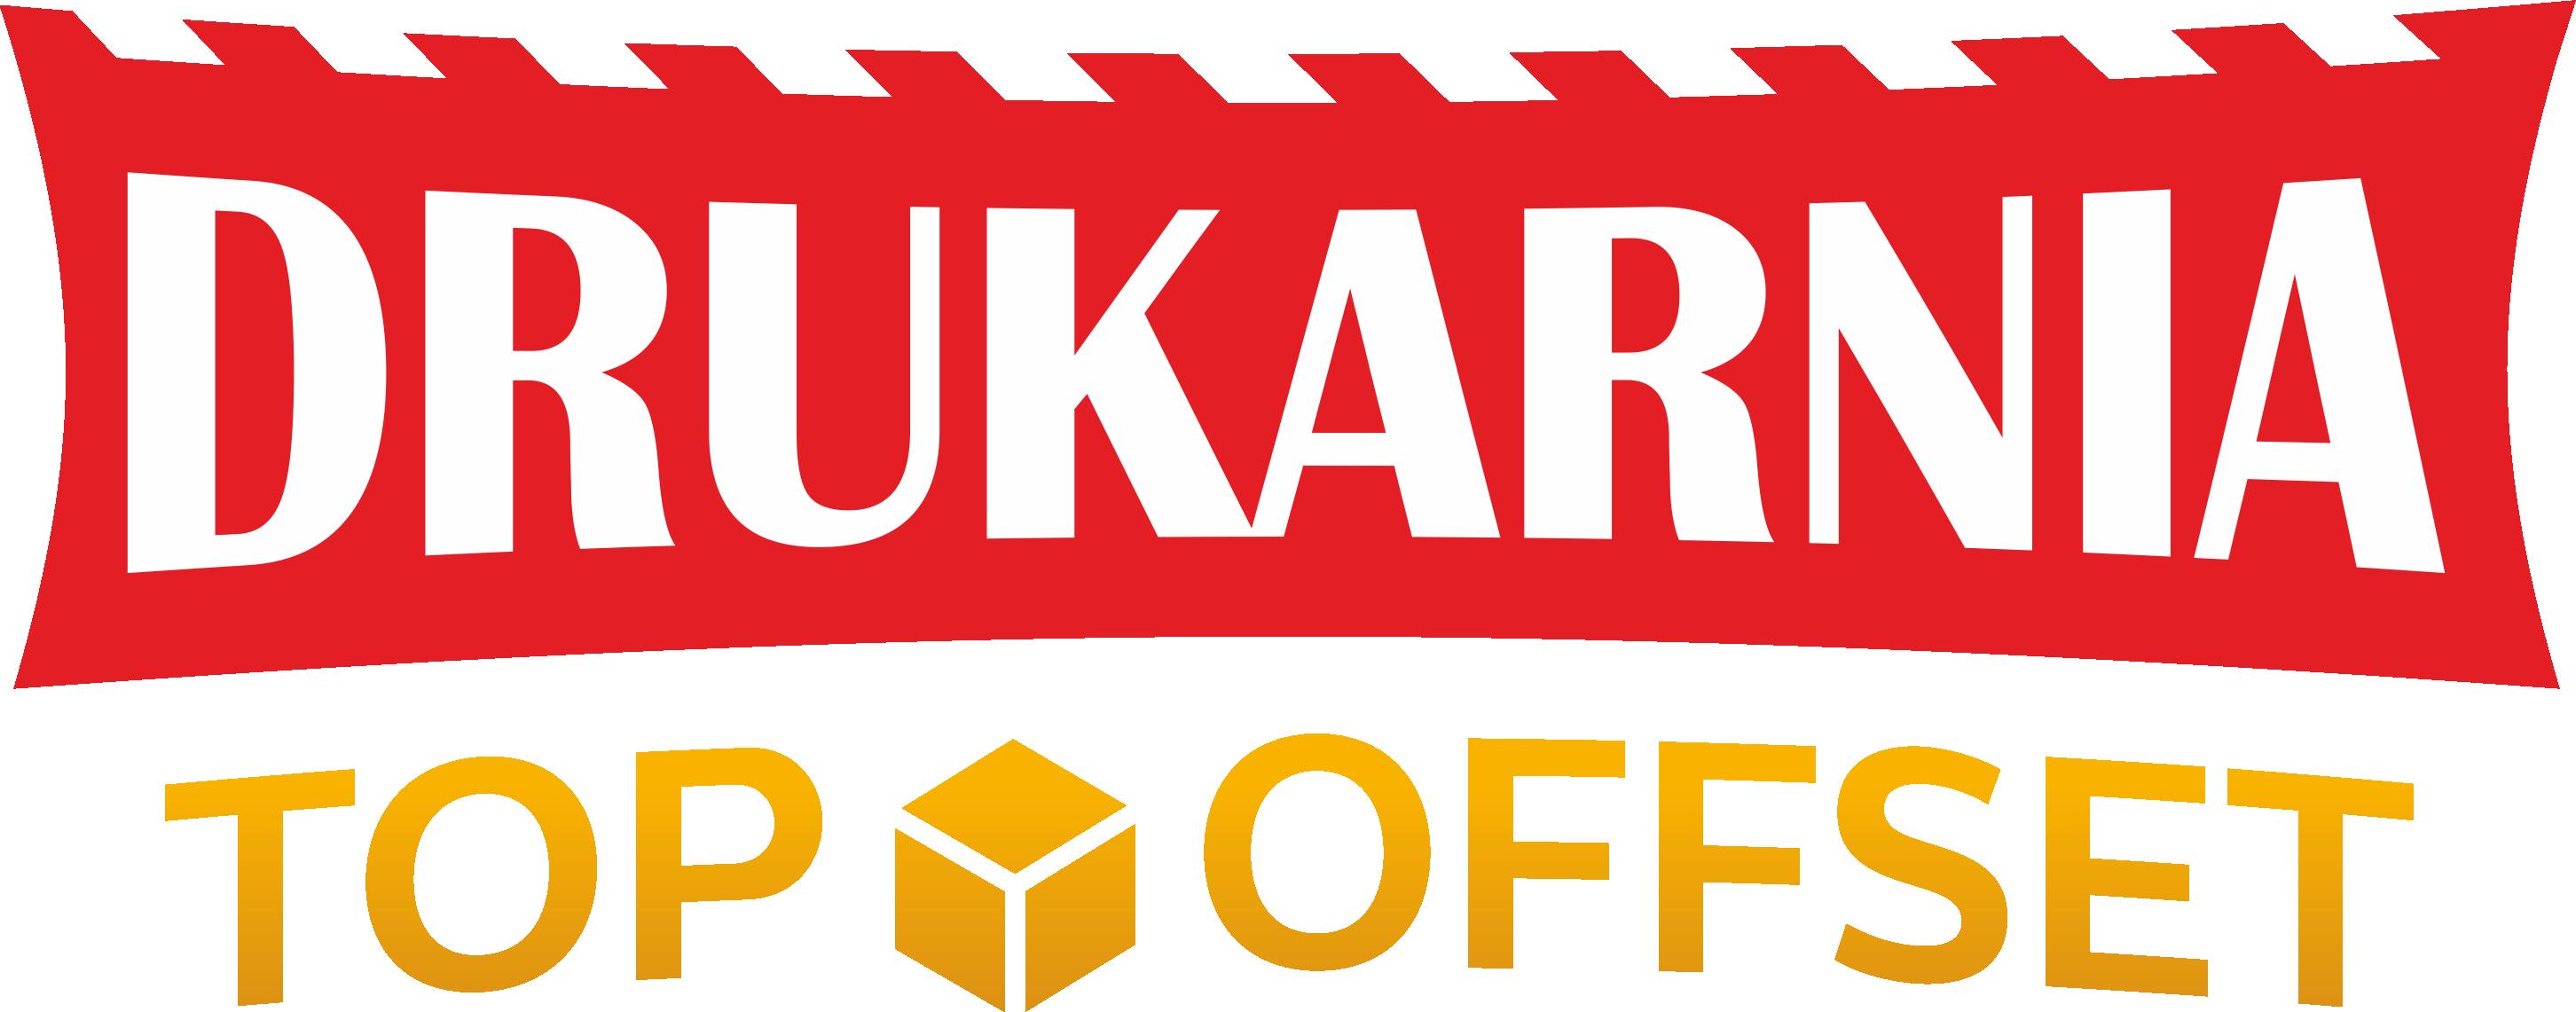 Drukarnia Top-Offset sp. z o.o.